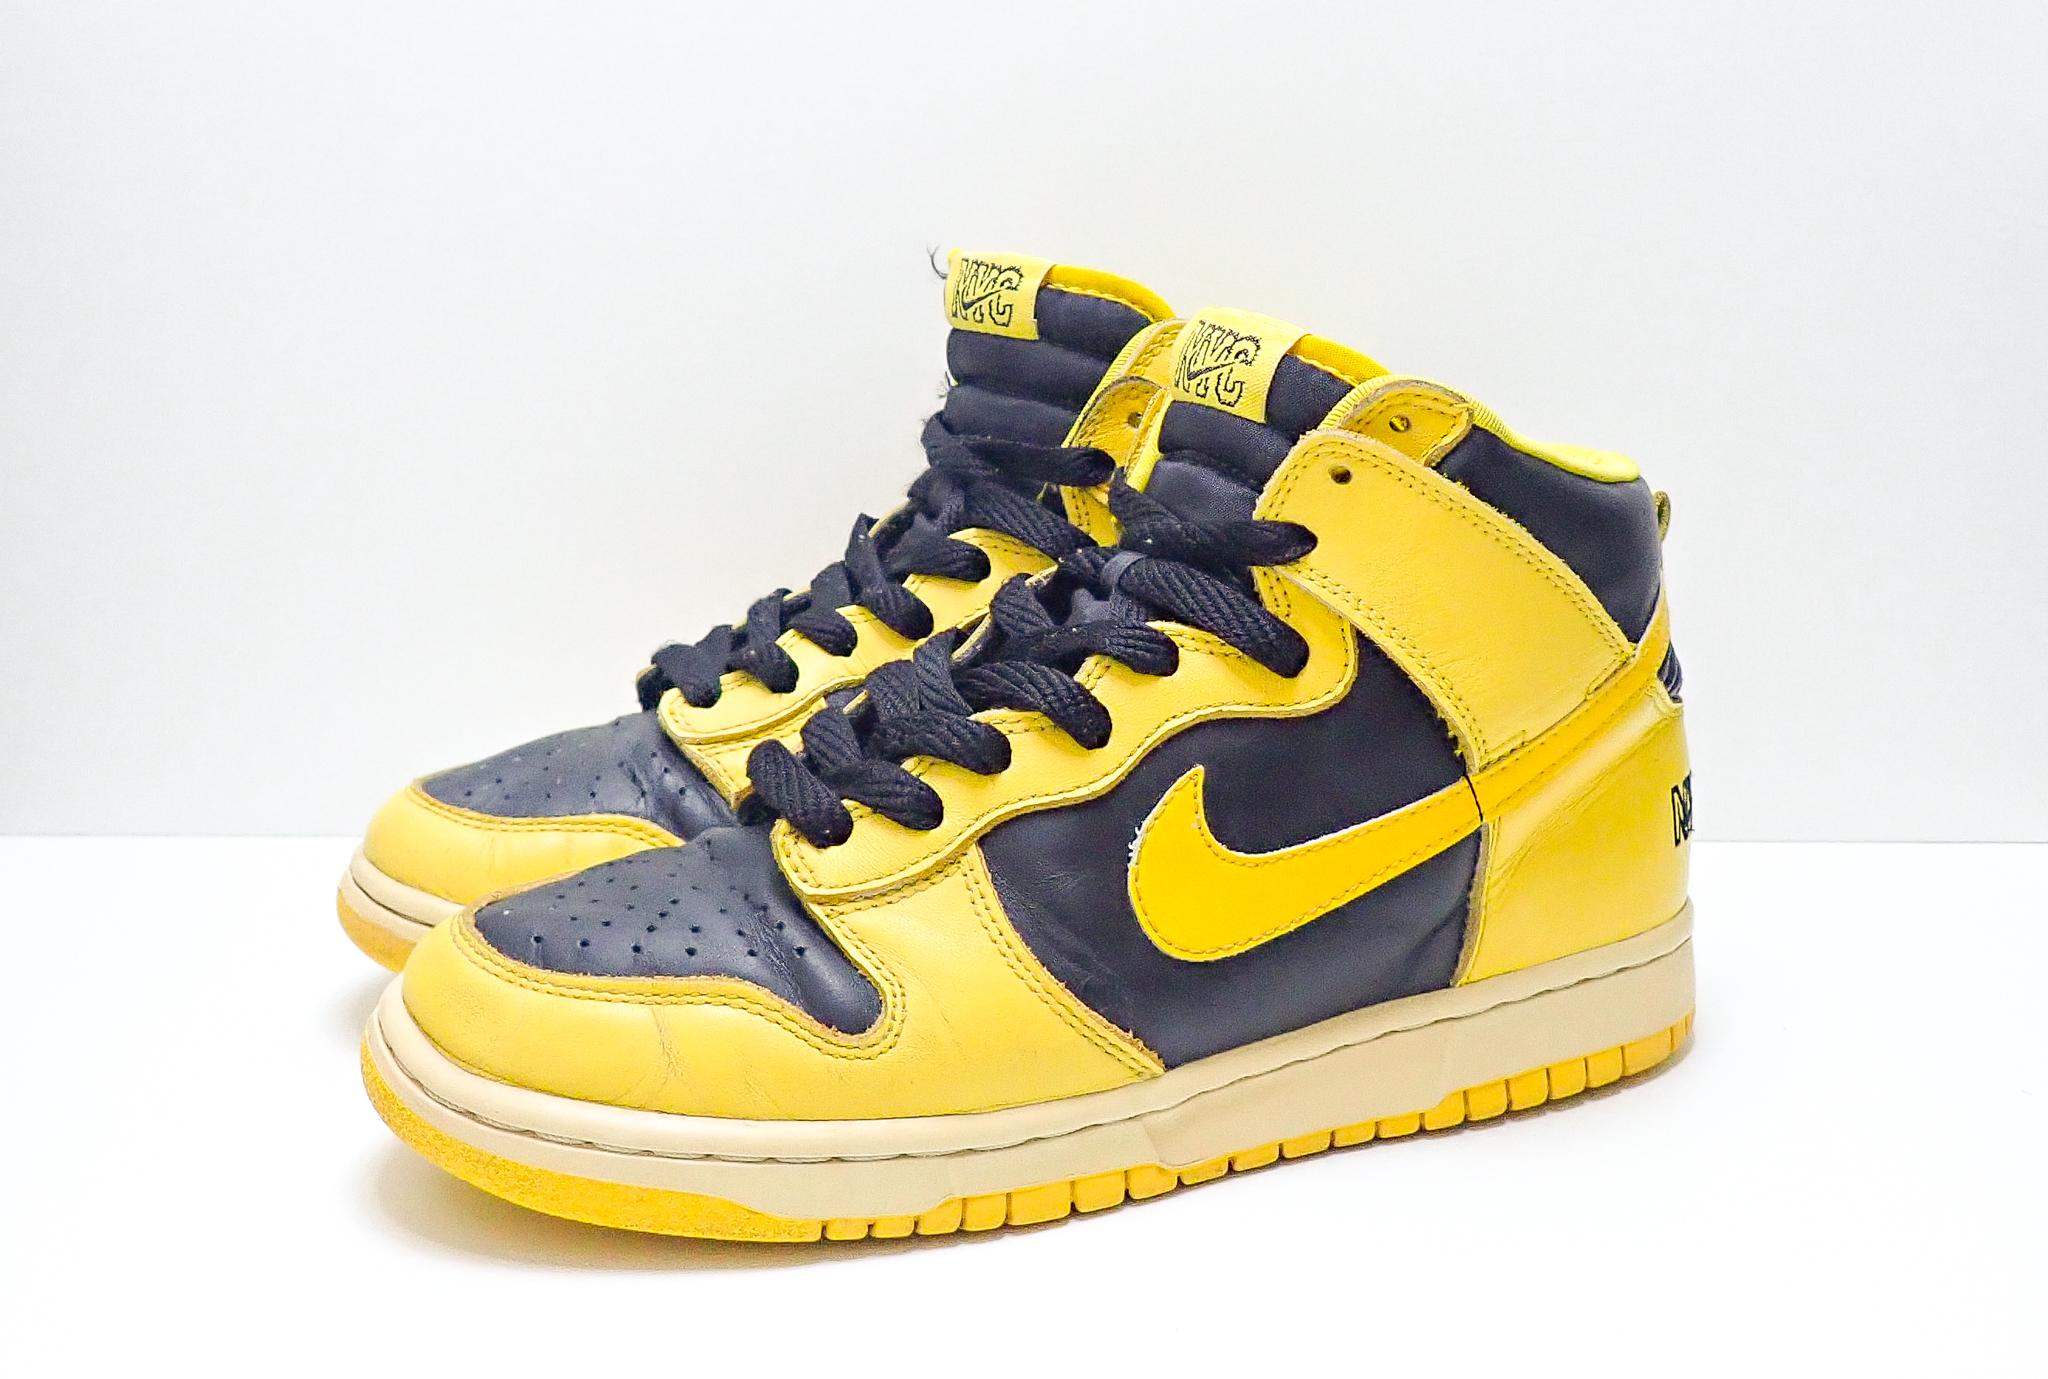 Nike Dunk High Le Goldenrod NYC